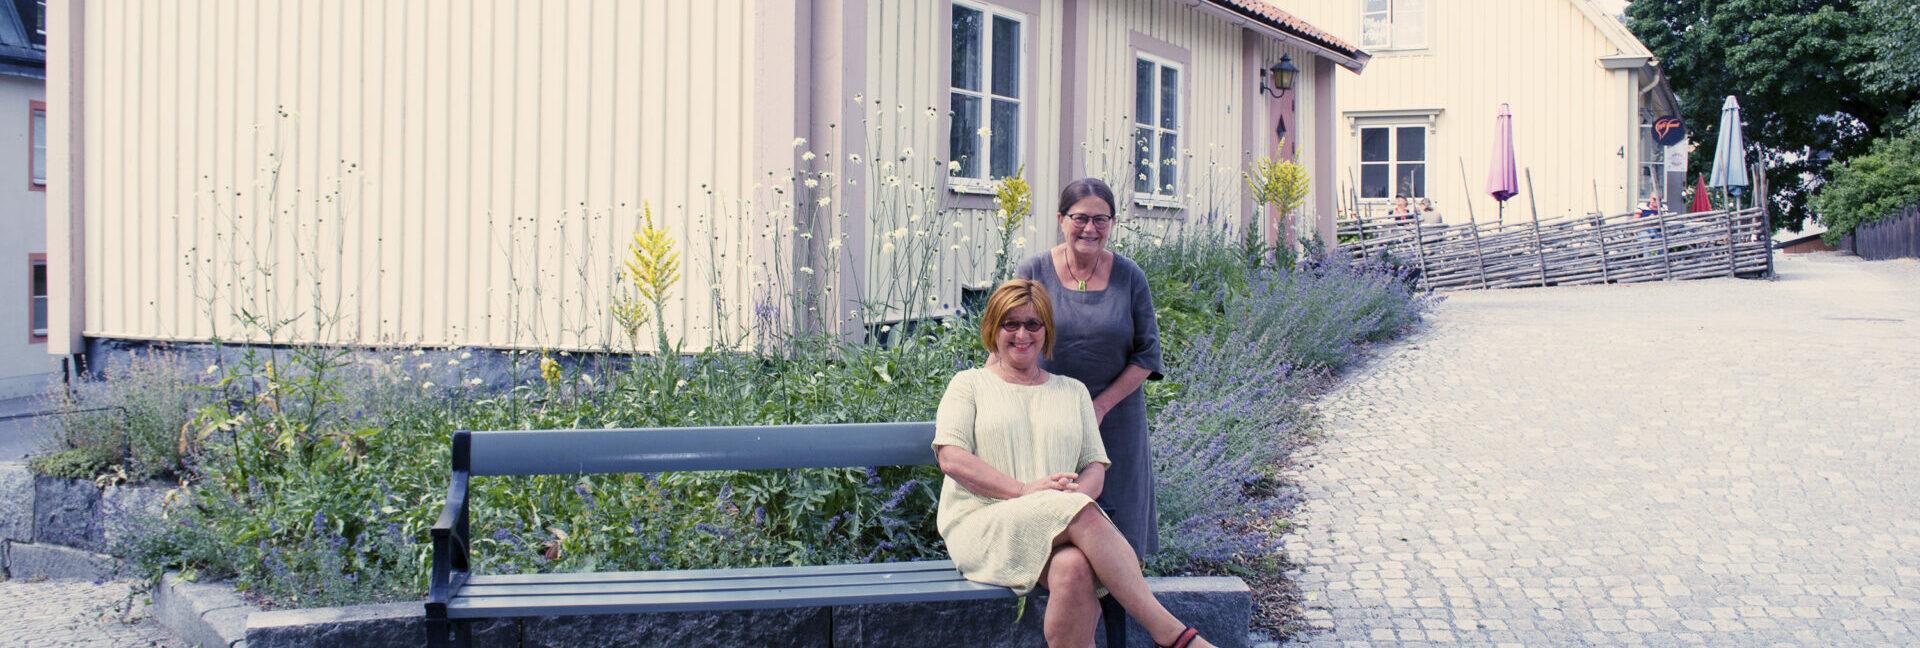 Trädgård, Hantverk, Garn, Lokalt, Enköping